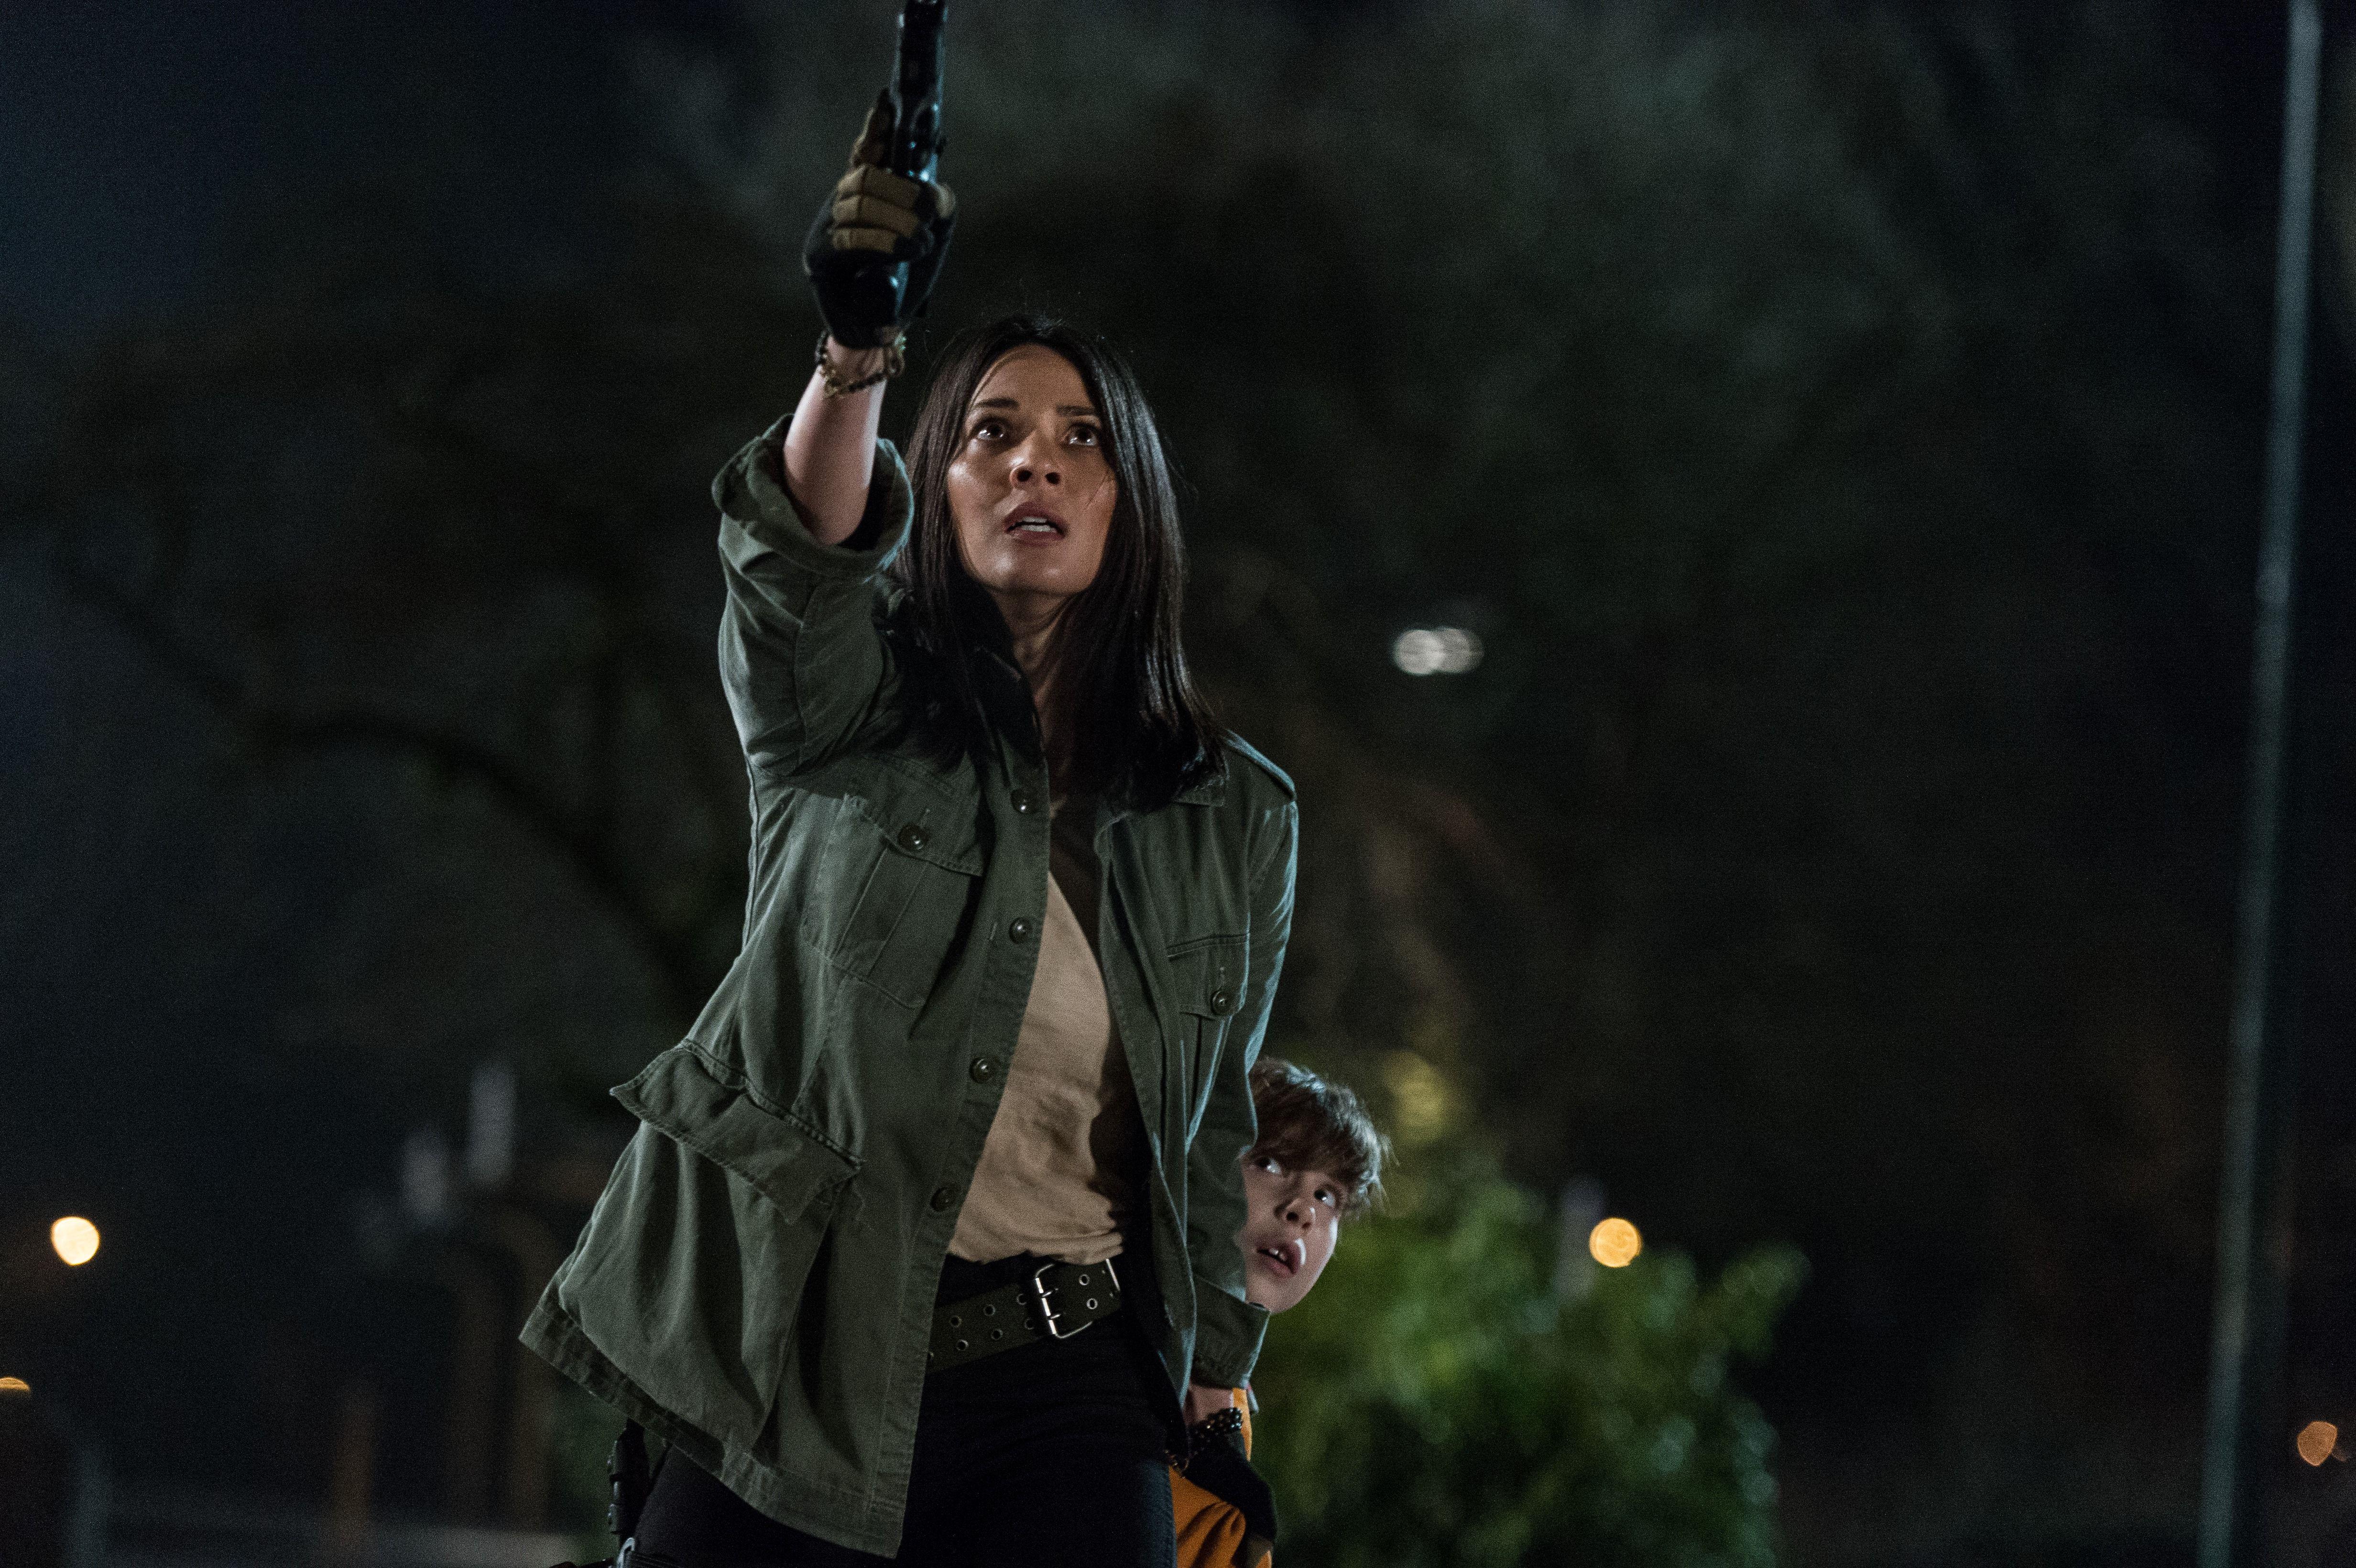 Predator 2018 4k Wallpapers: 1920x1080 Olivia Munn In The Predator Movie 2018 Laptop